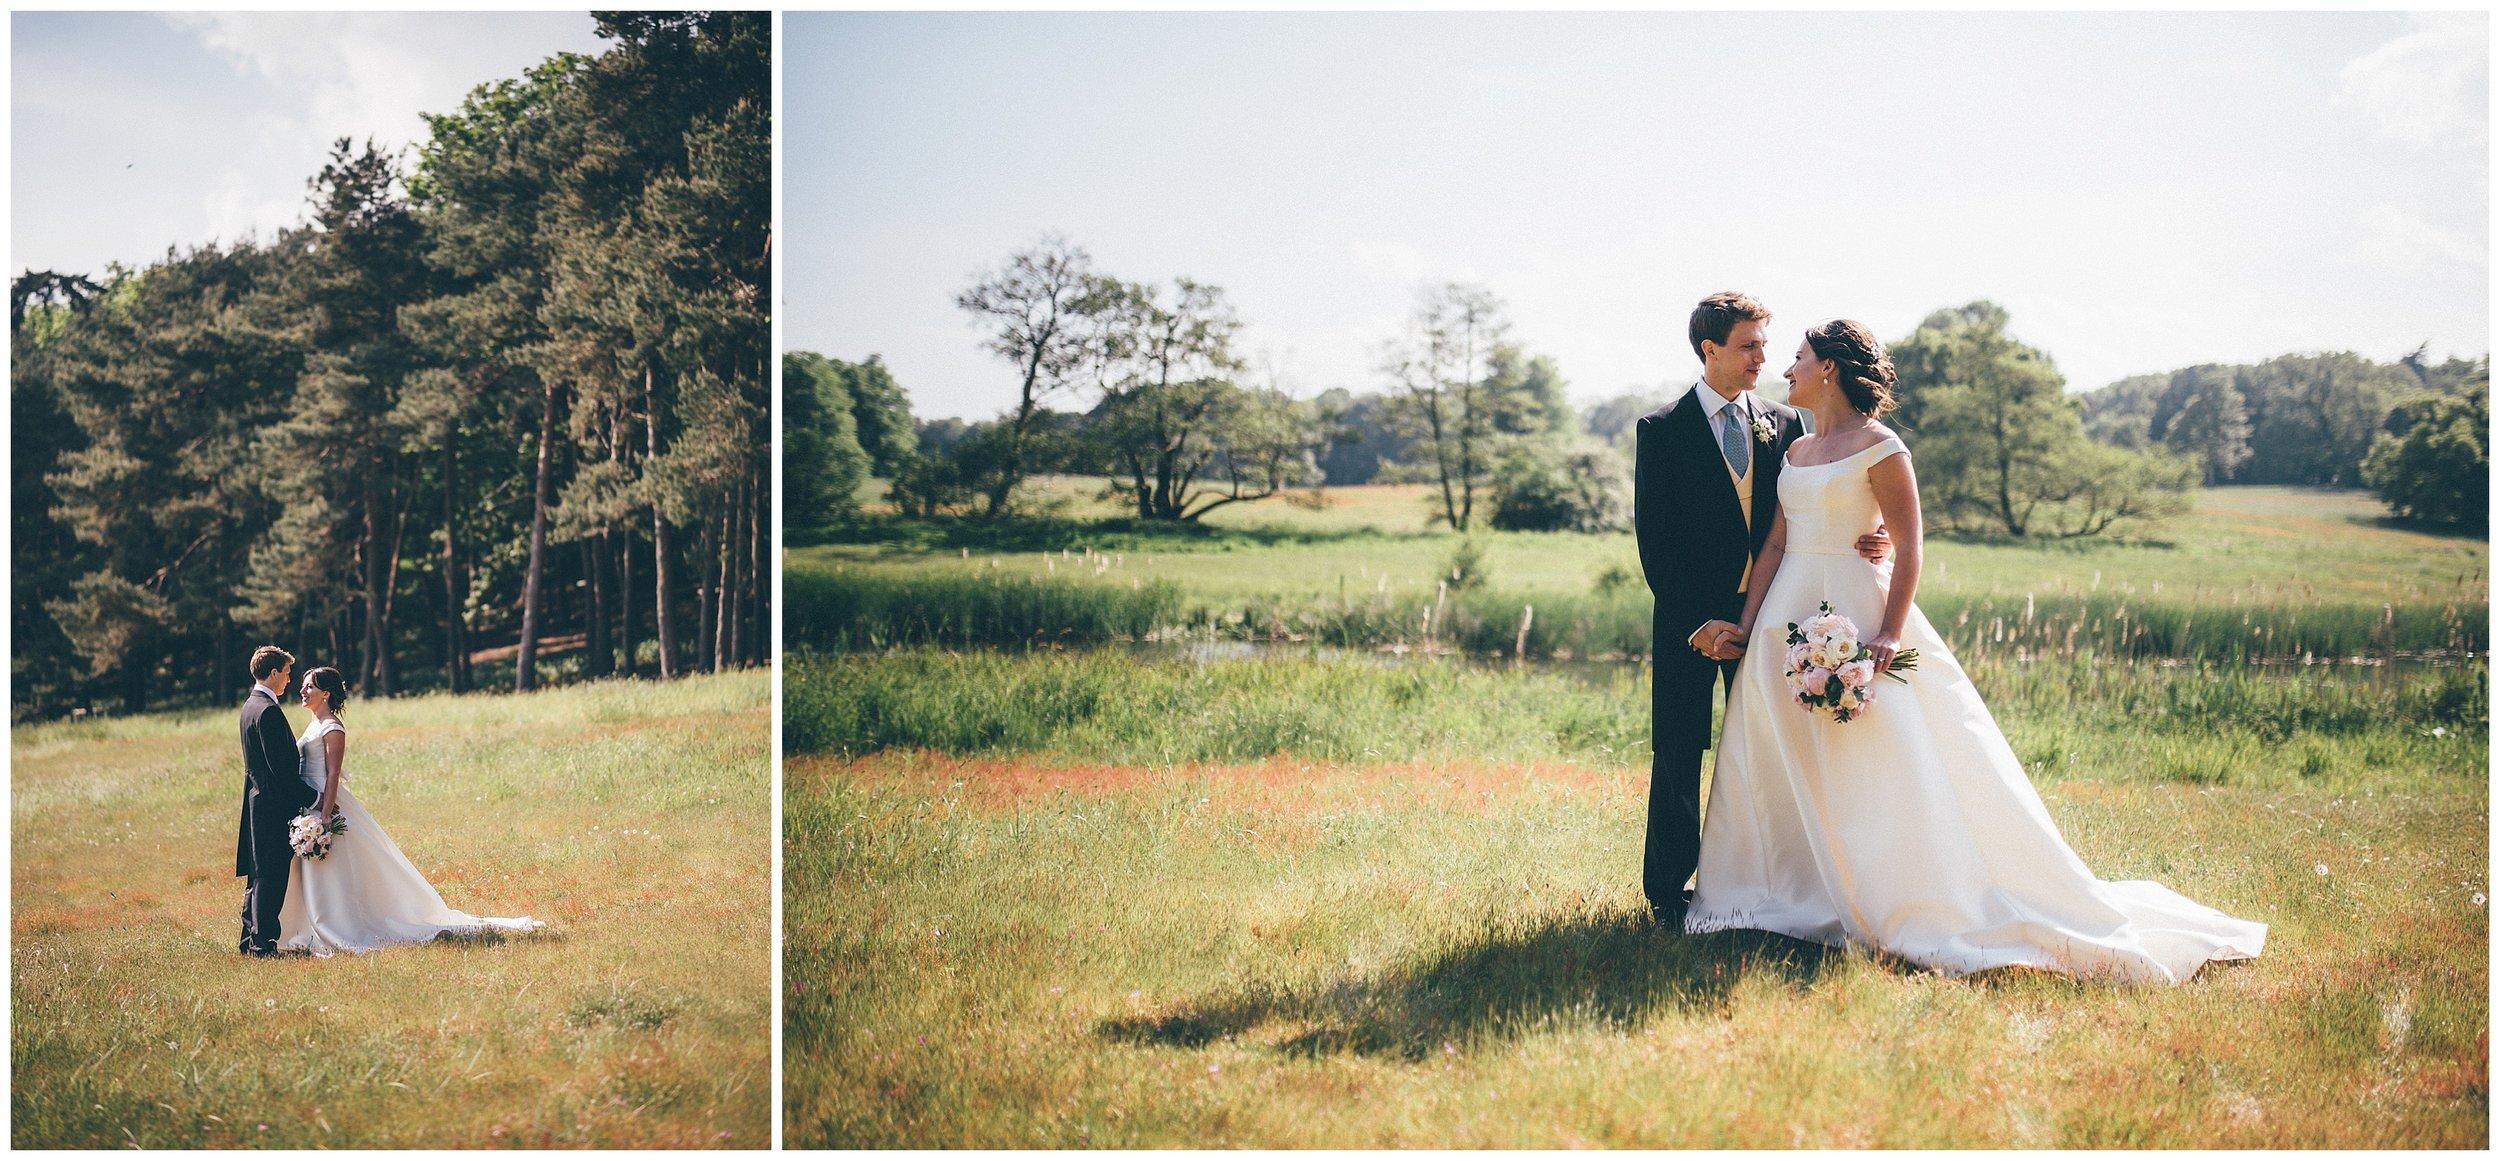 Cheshire wedding photographer at Henham Park wedding barns.